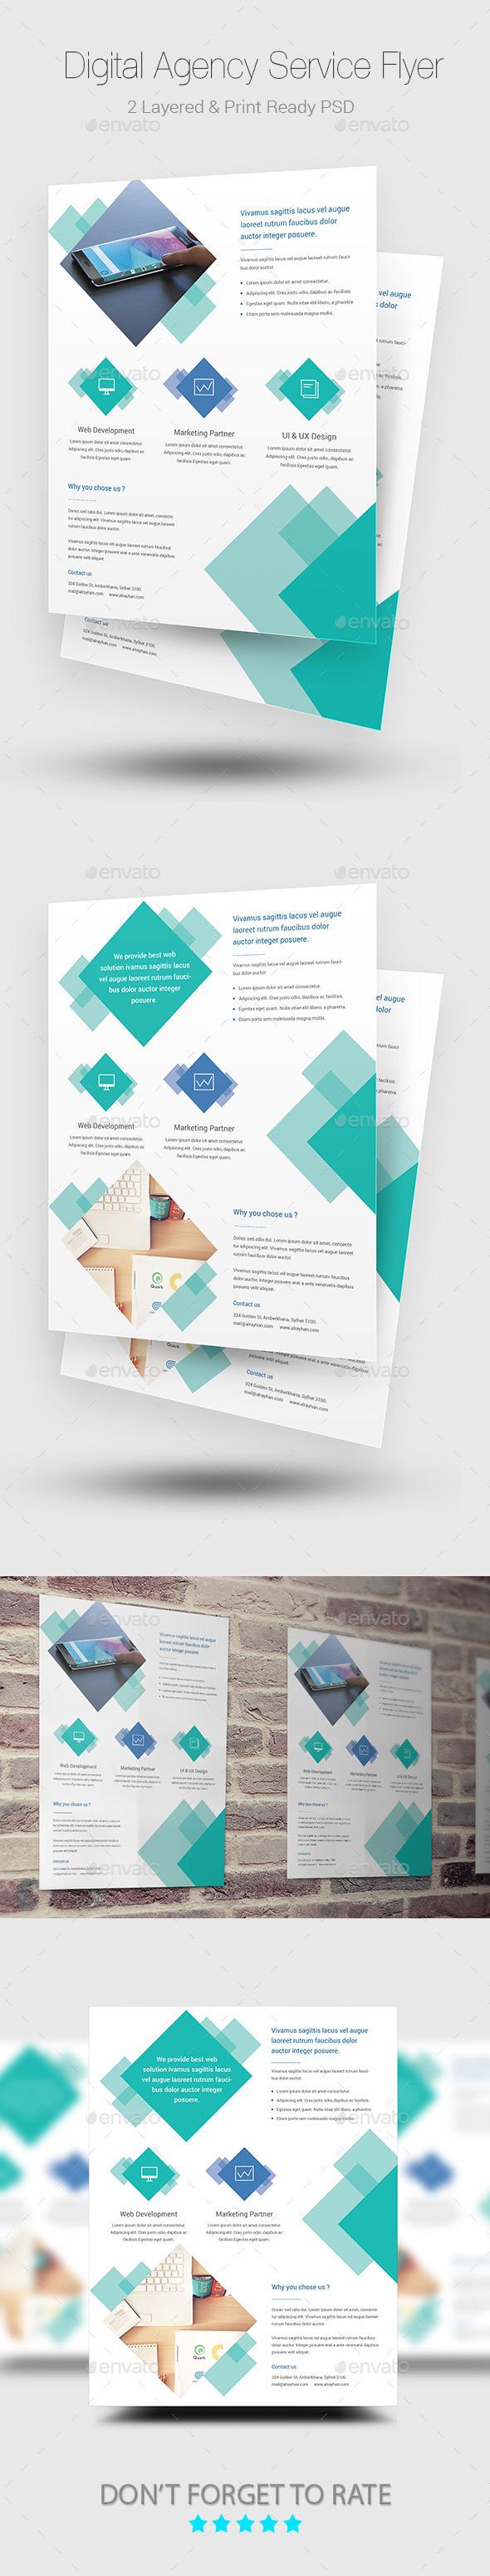 Digital Agency Flyer Templates - Corporate Flyers